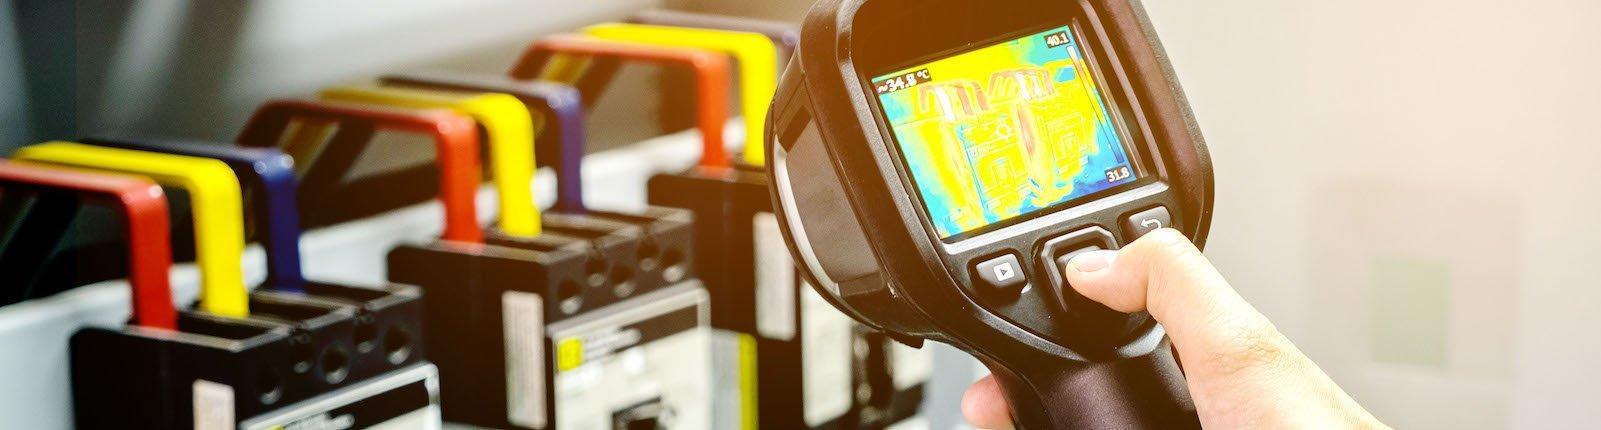 Close-up of hand using thermal imaging camera to check temperature